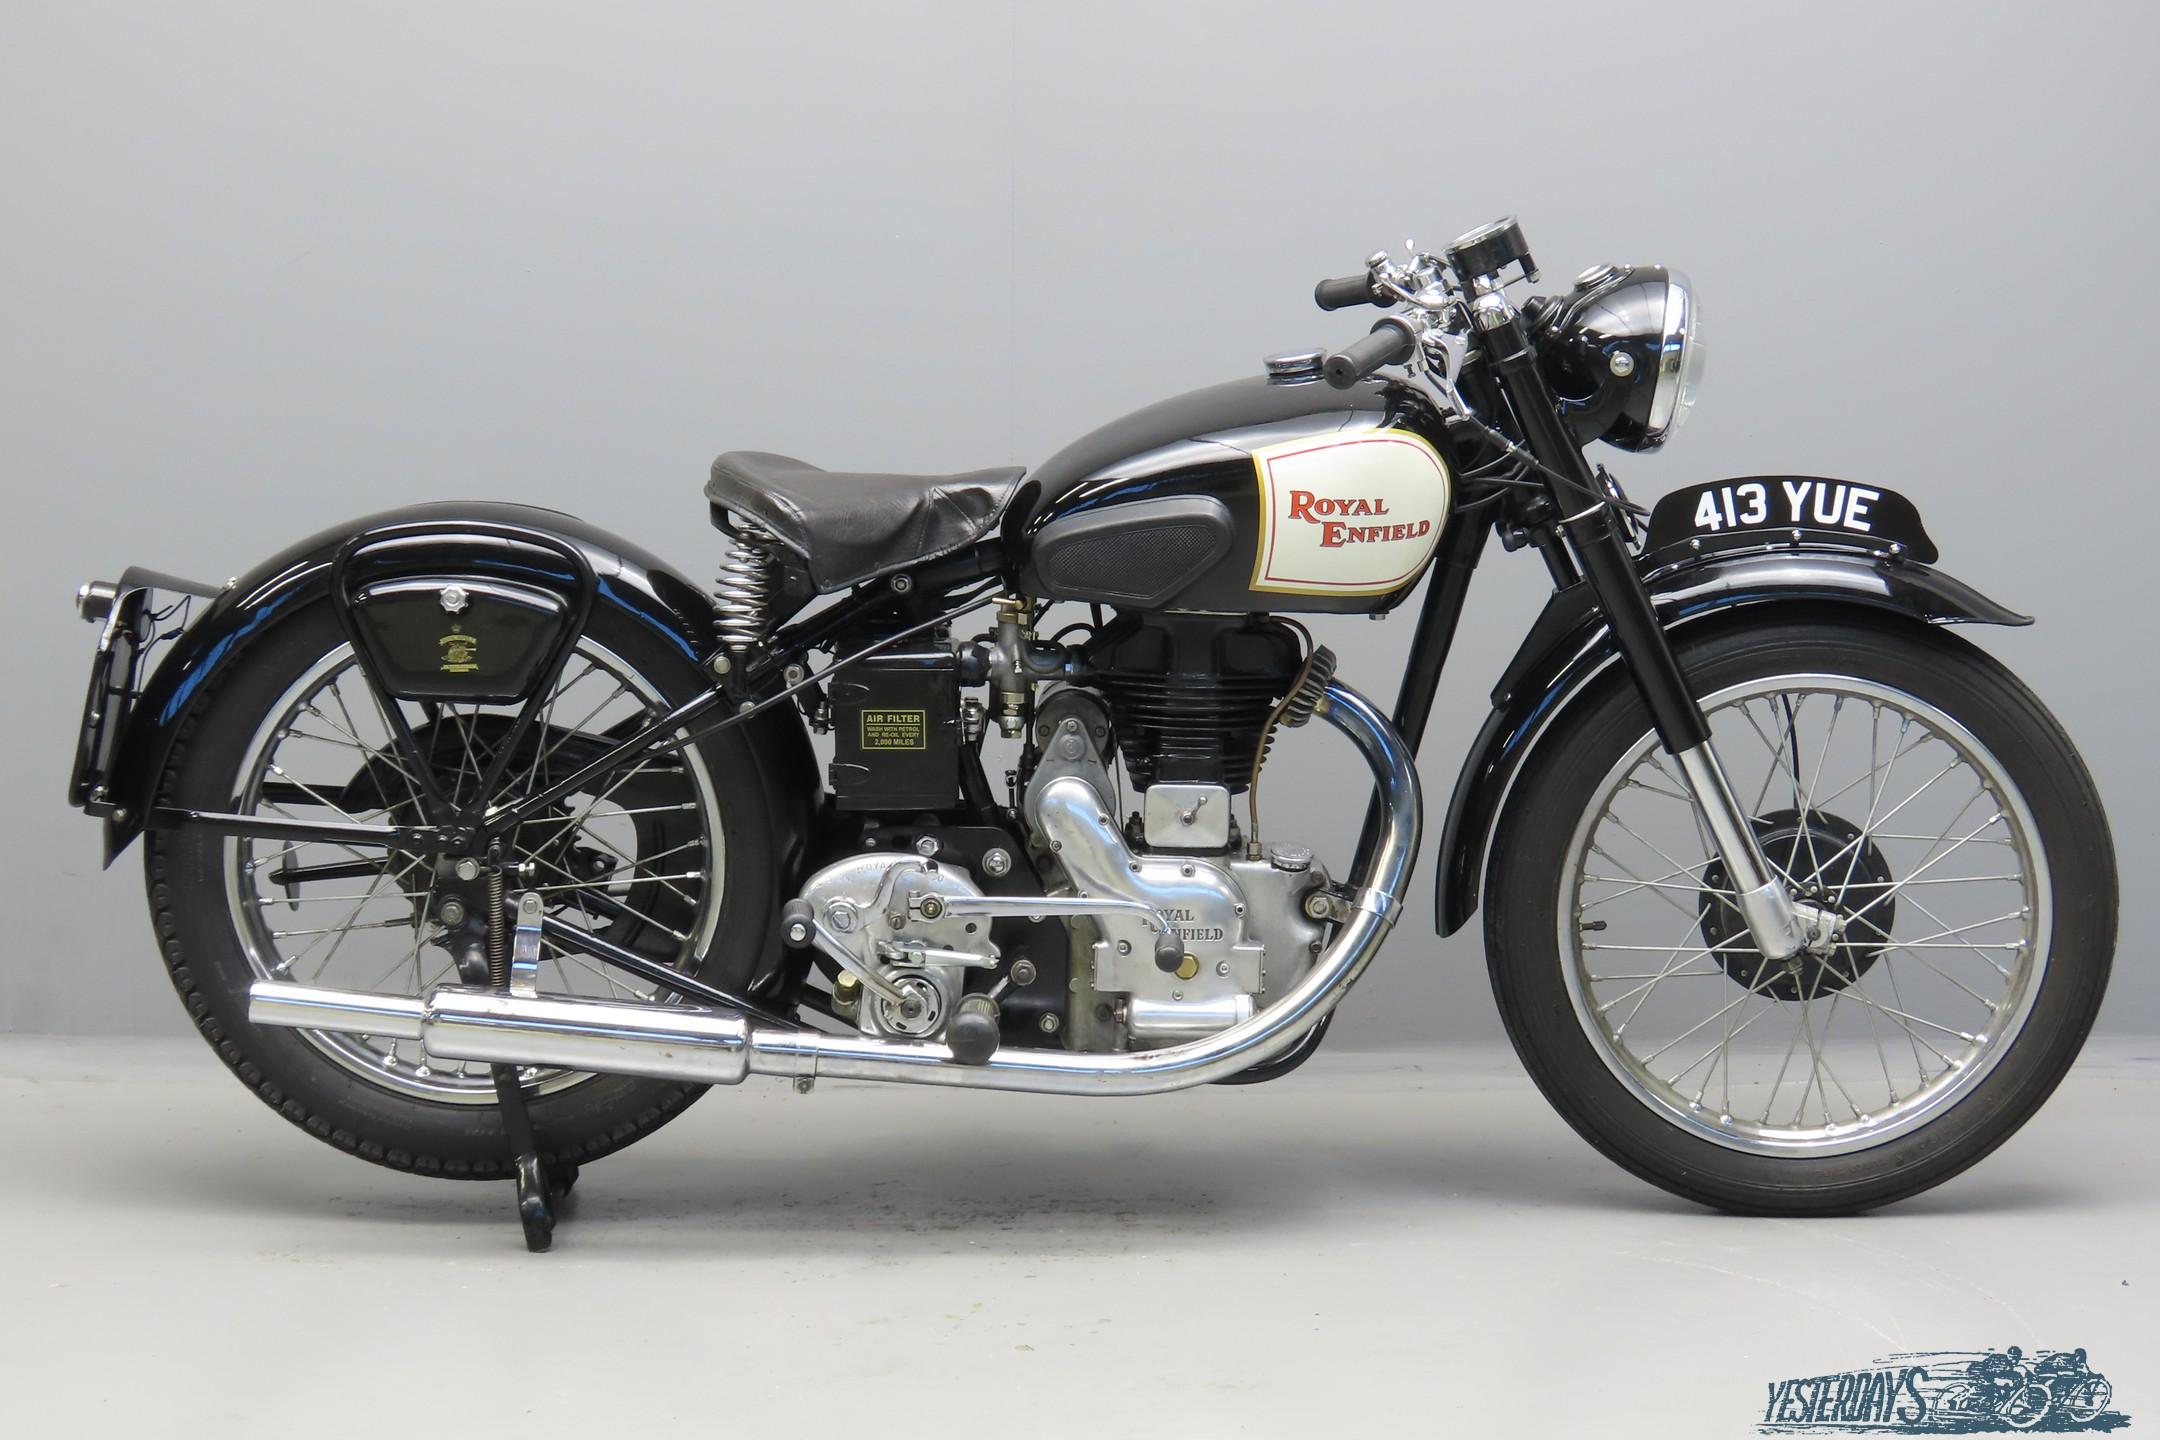 Royal Enfield 1949 Model G 346cc 1 cyl sv 3010